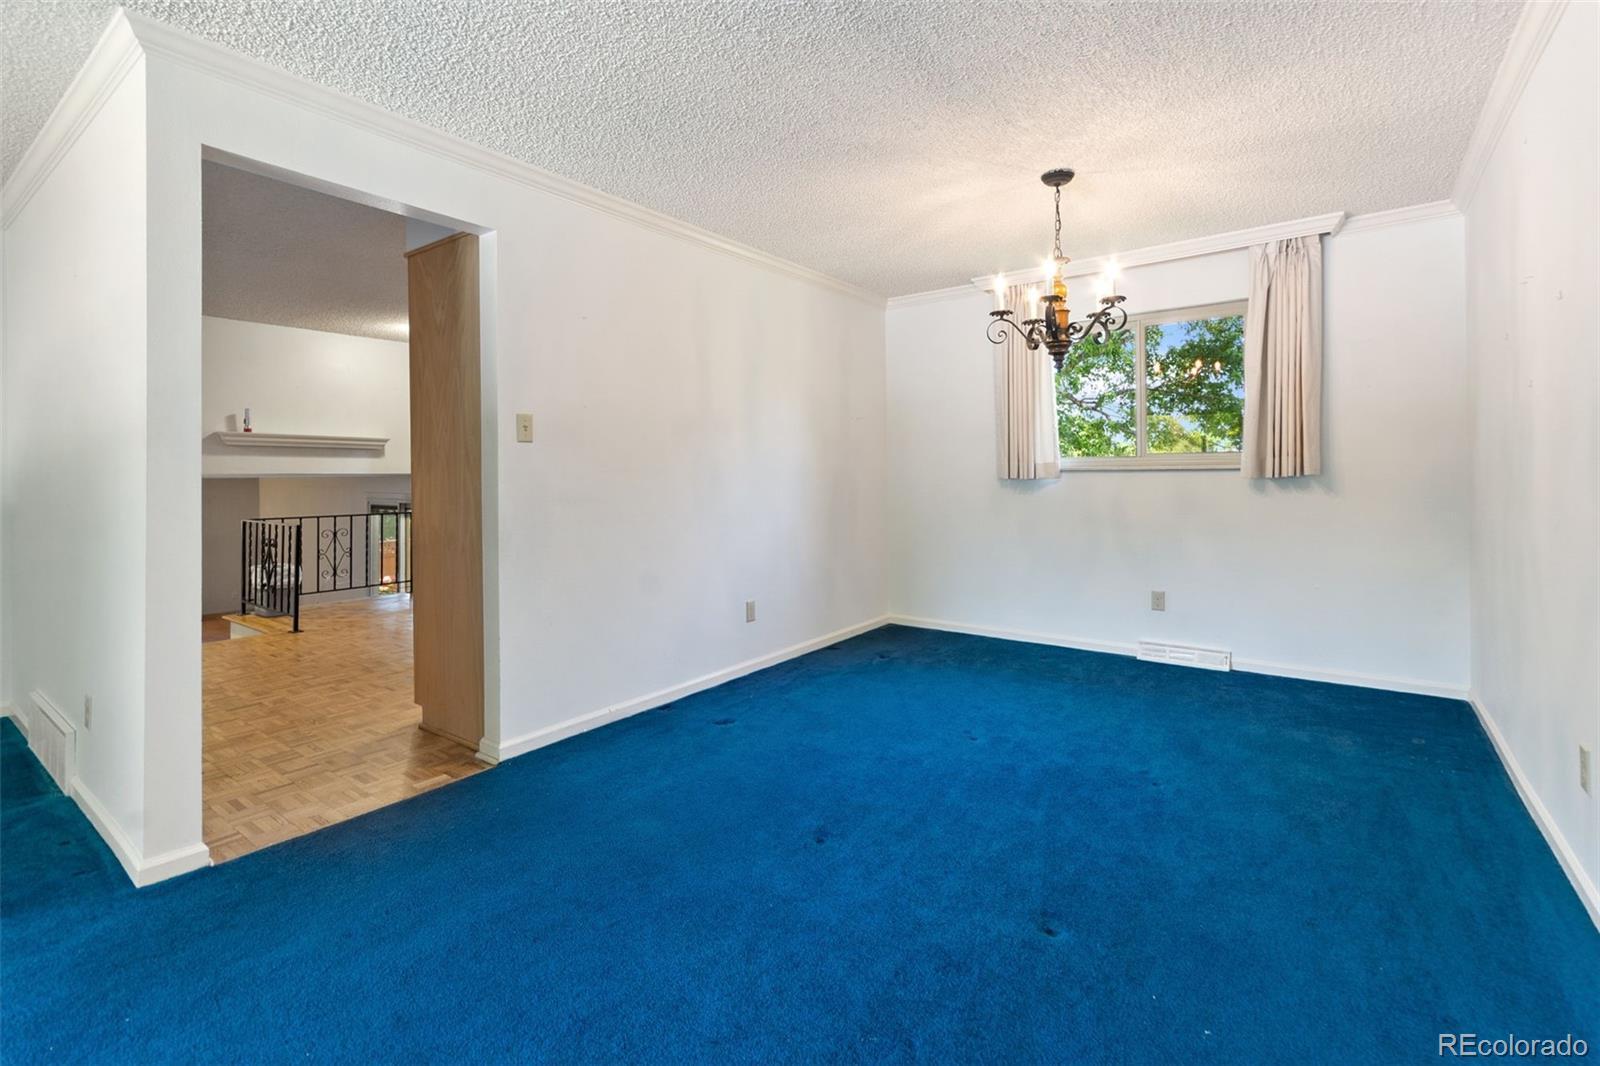 MLS# 7770404 - 7 - 2355 S Hoyt Street, Lakewood, CO 80227